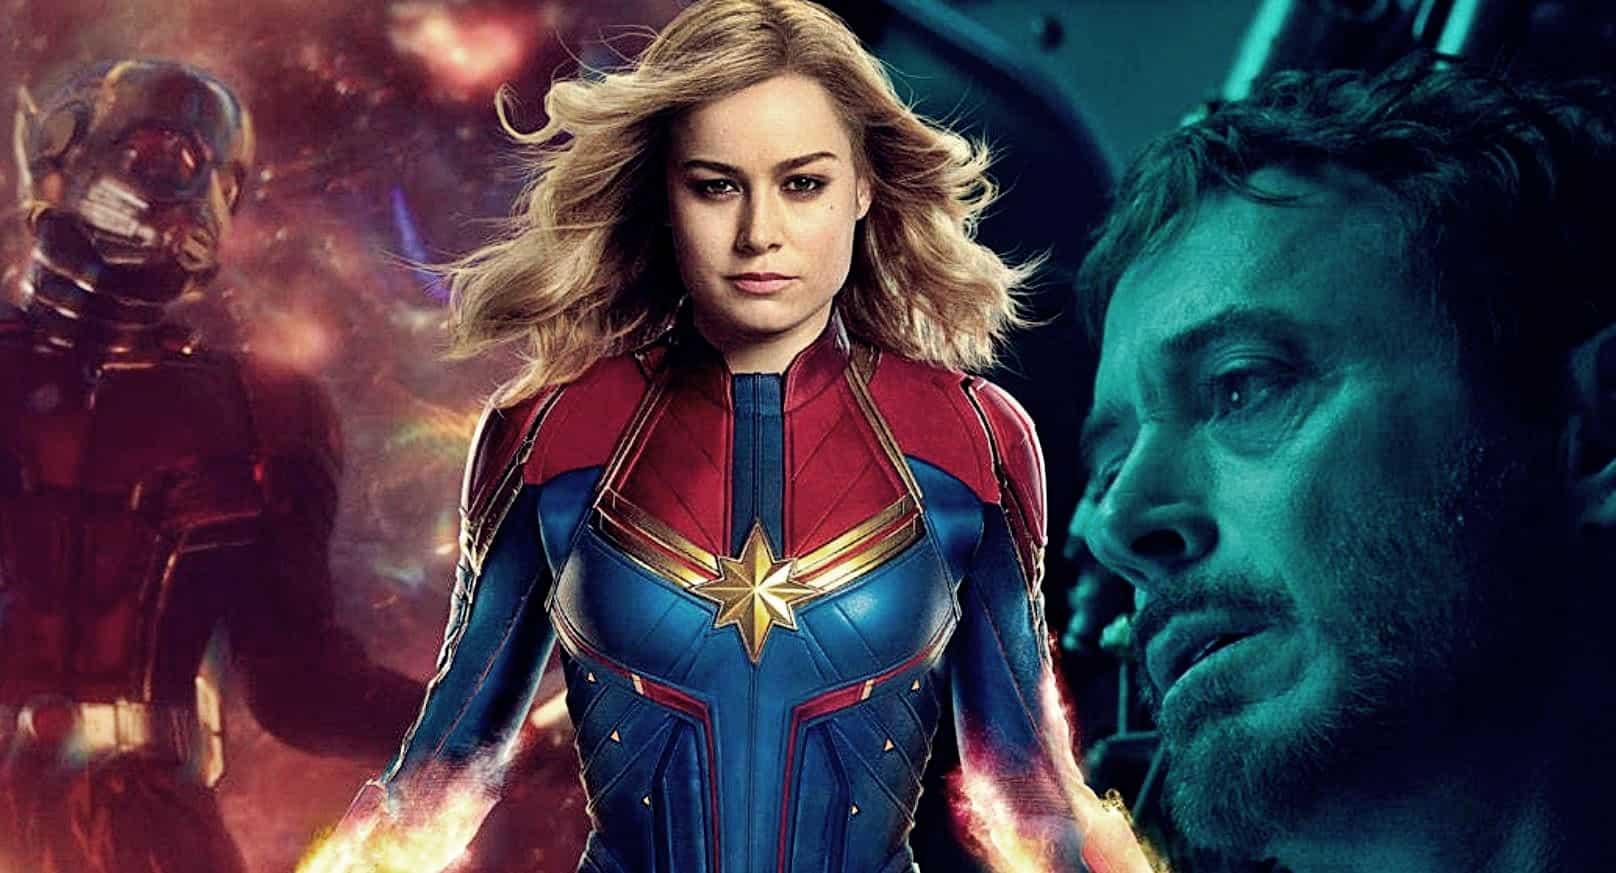 MCU Phase 4 Captain Marvel